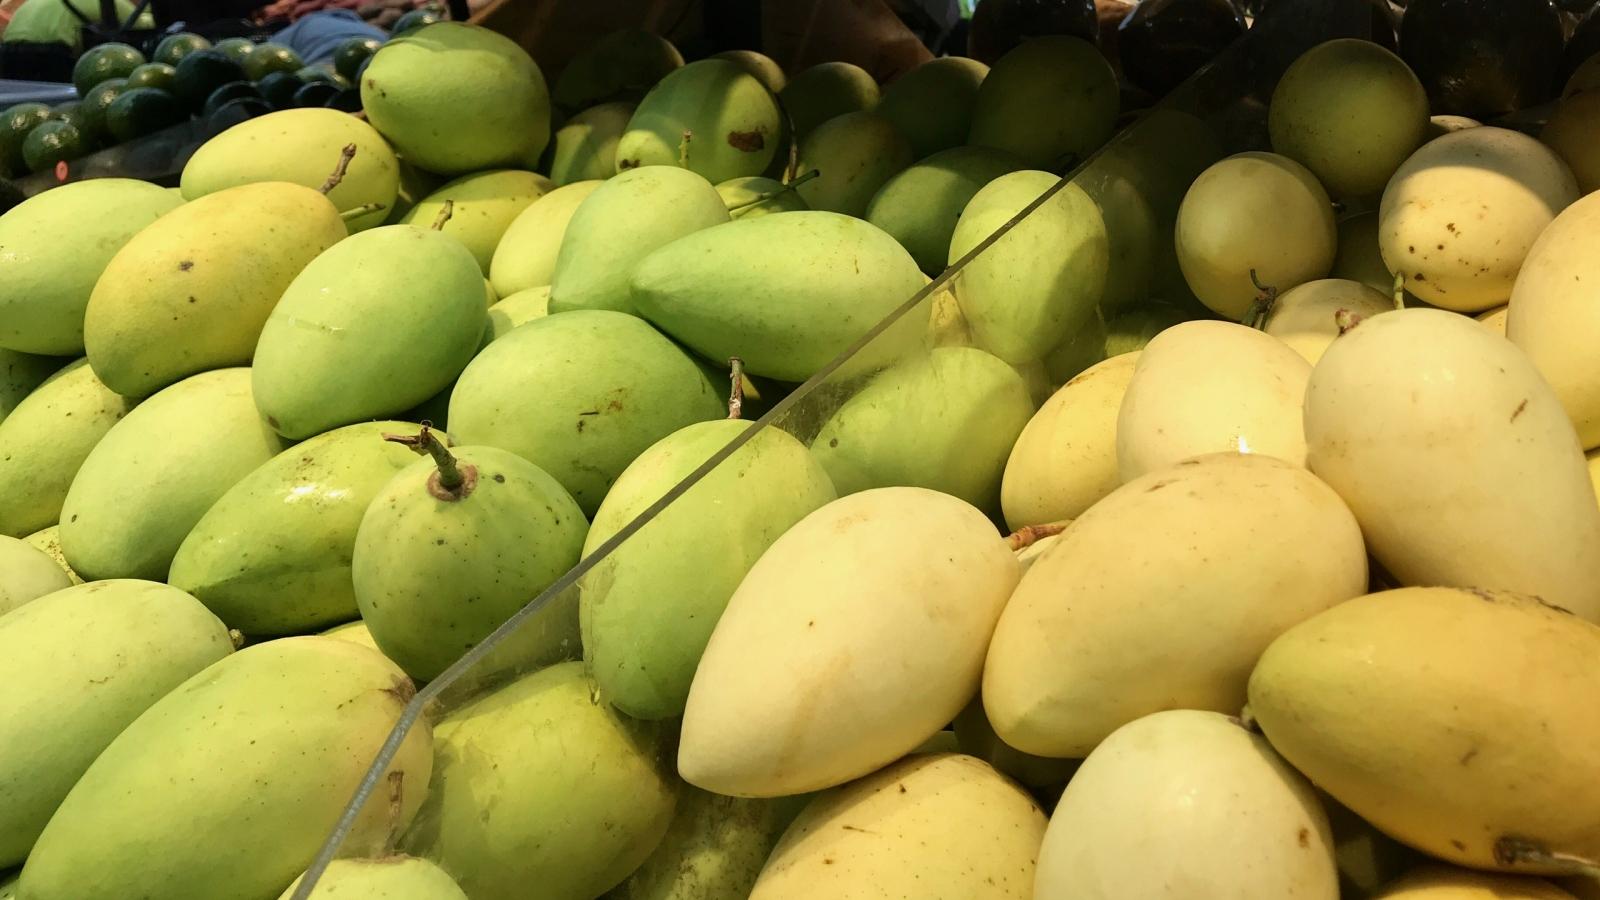 US increases imports of Vietnamese mangoes